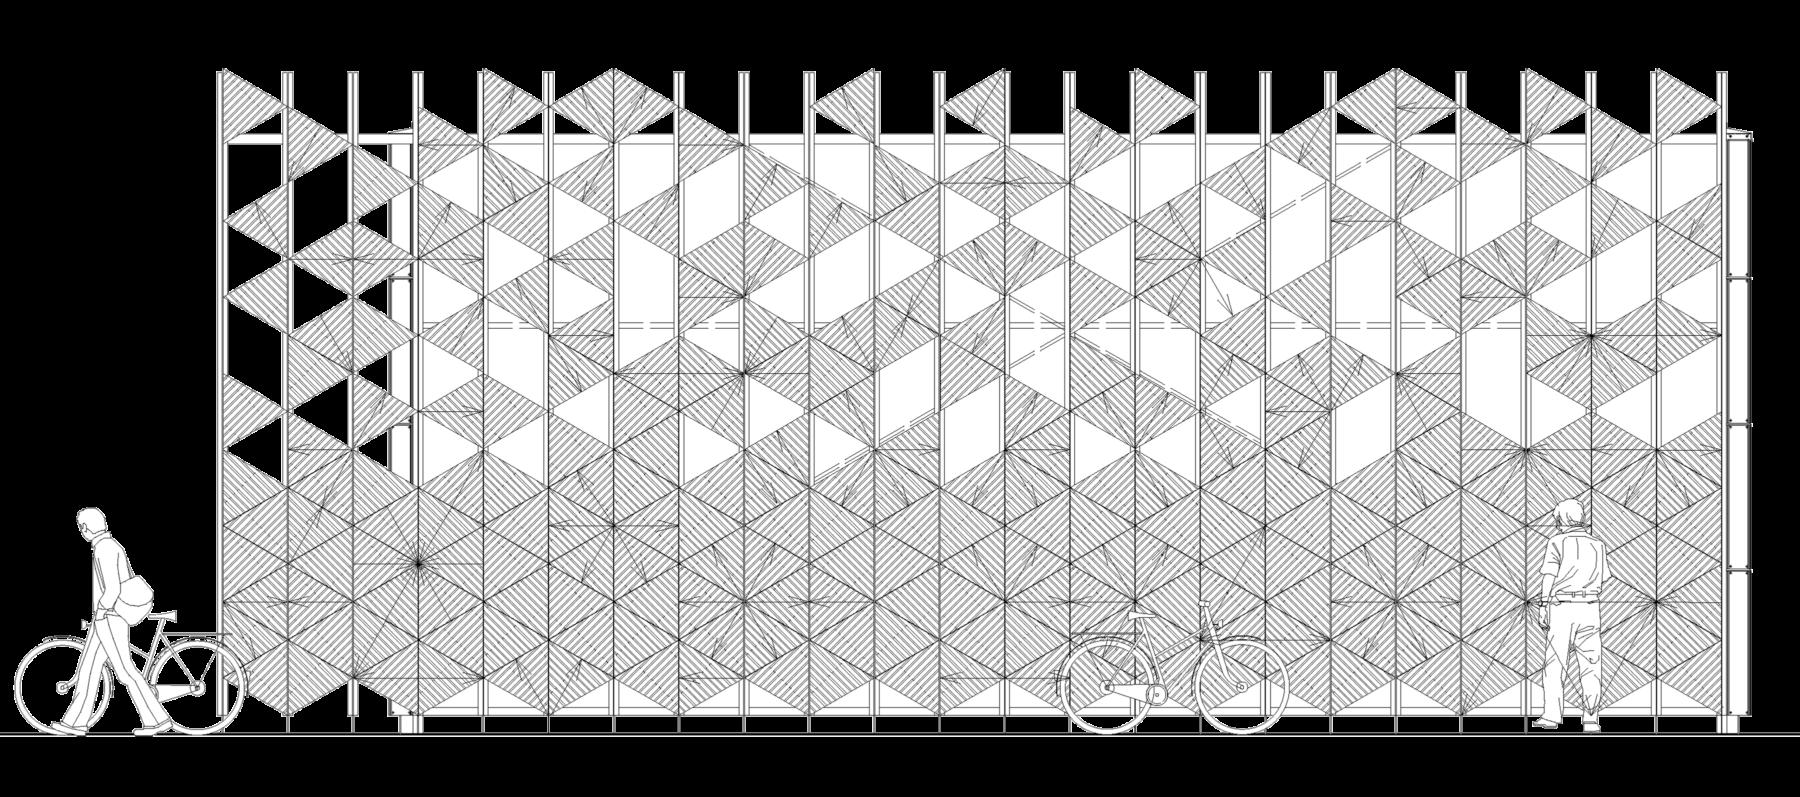 Sarah-Wigglesworth-Architects Bermondsey-Bike-Store-elevation 3600